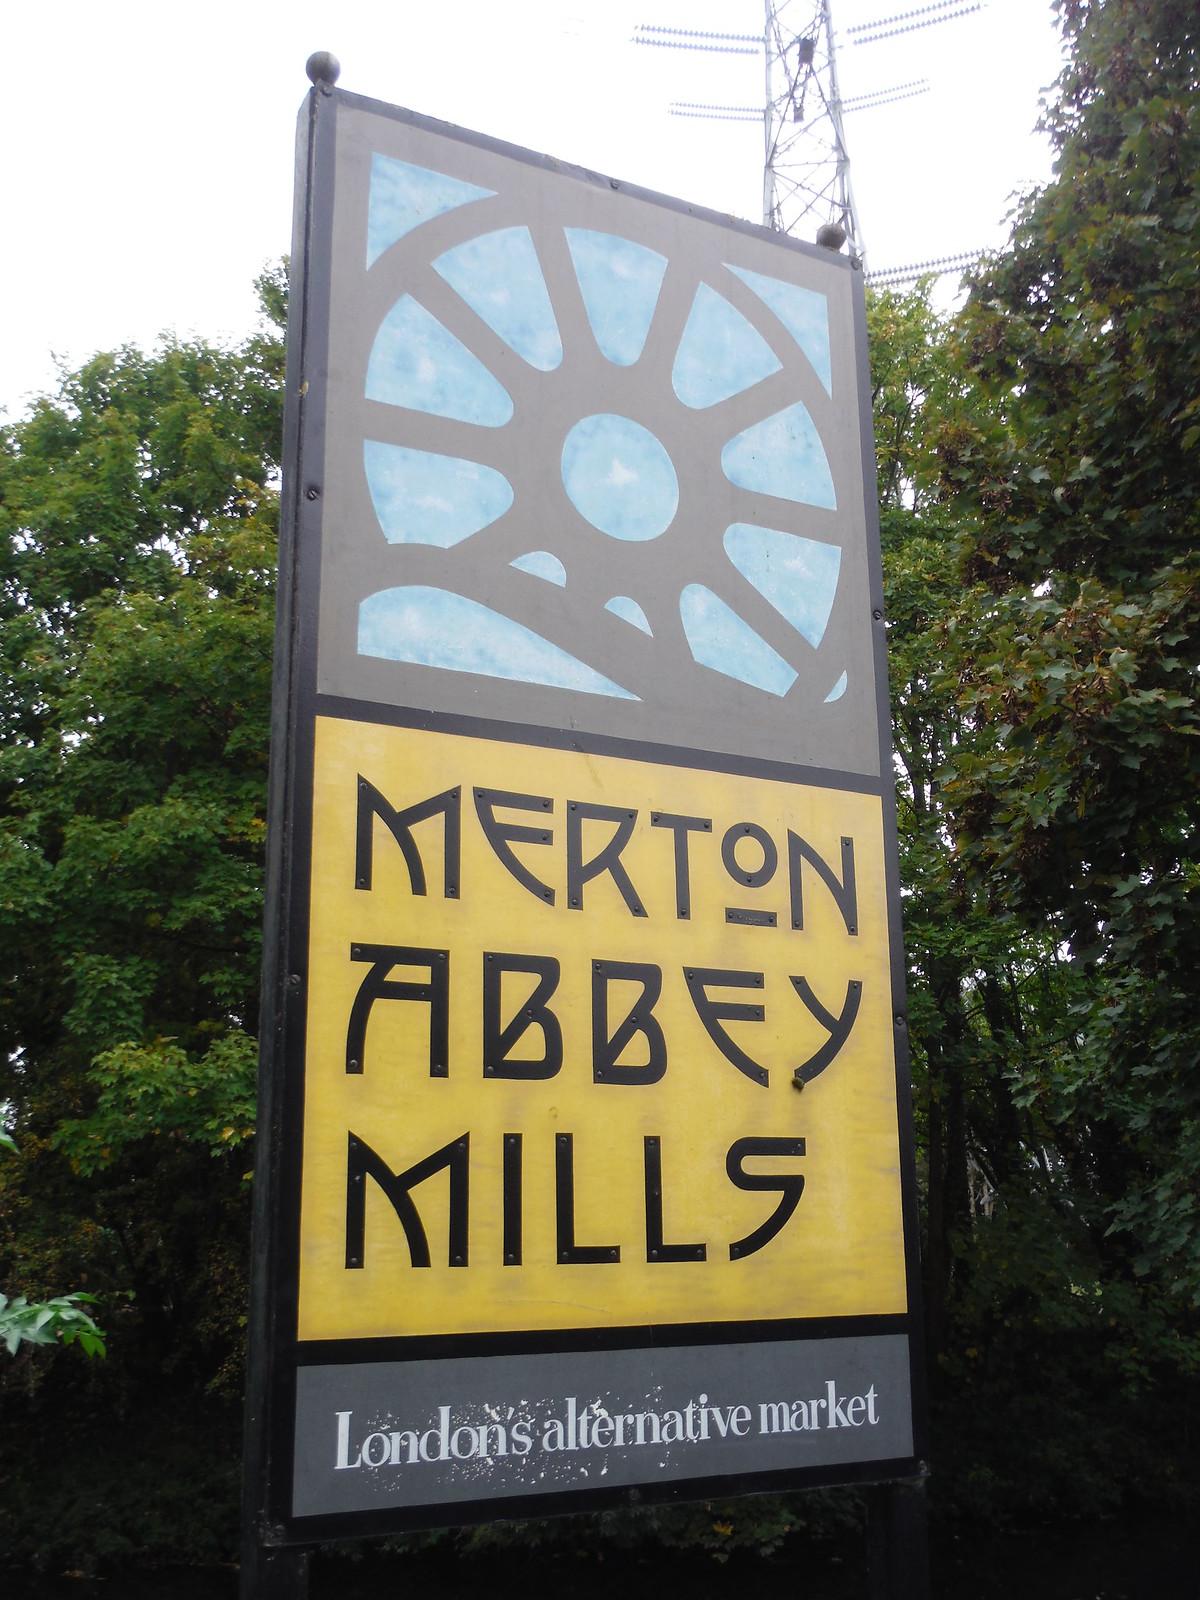 Merton Abbey Mills Sign SWC Walk Short 13 - Morden Hall Park and Merton Abbey Mills